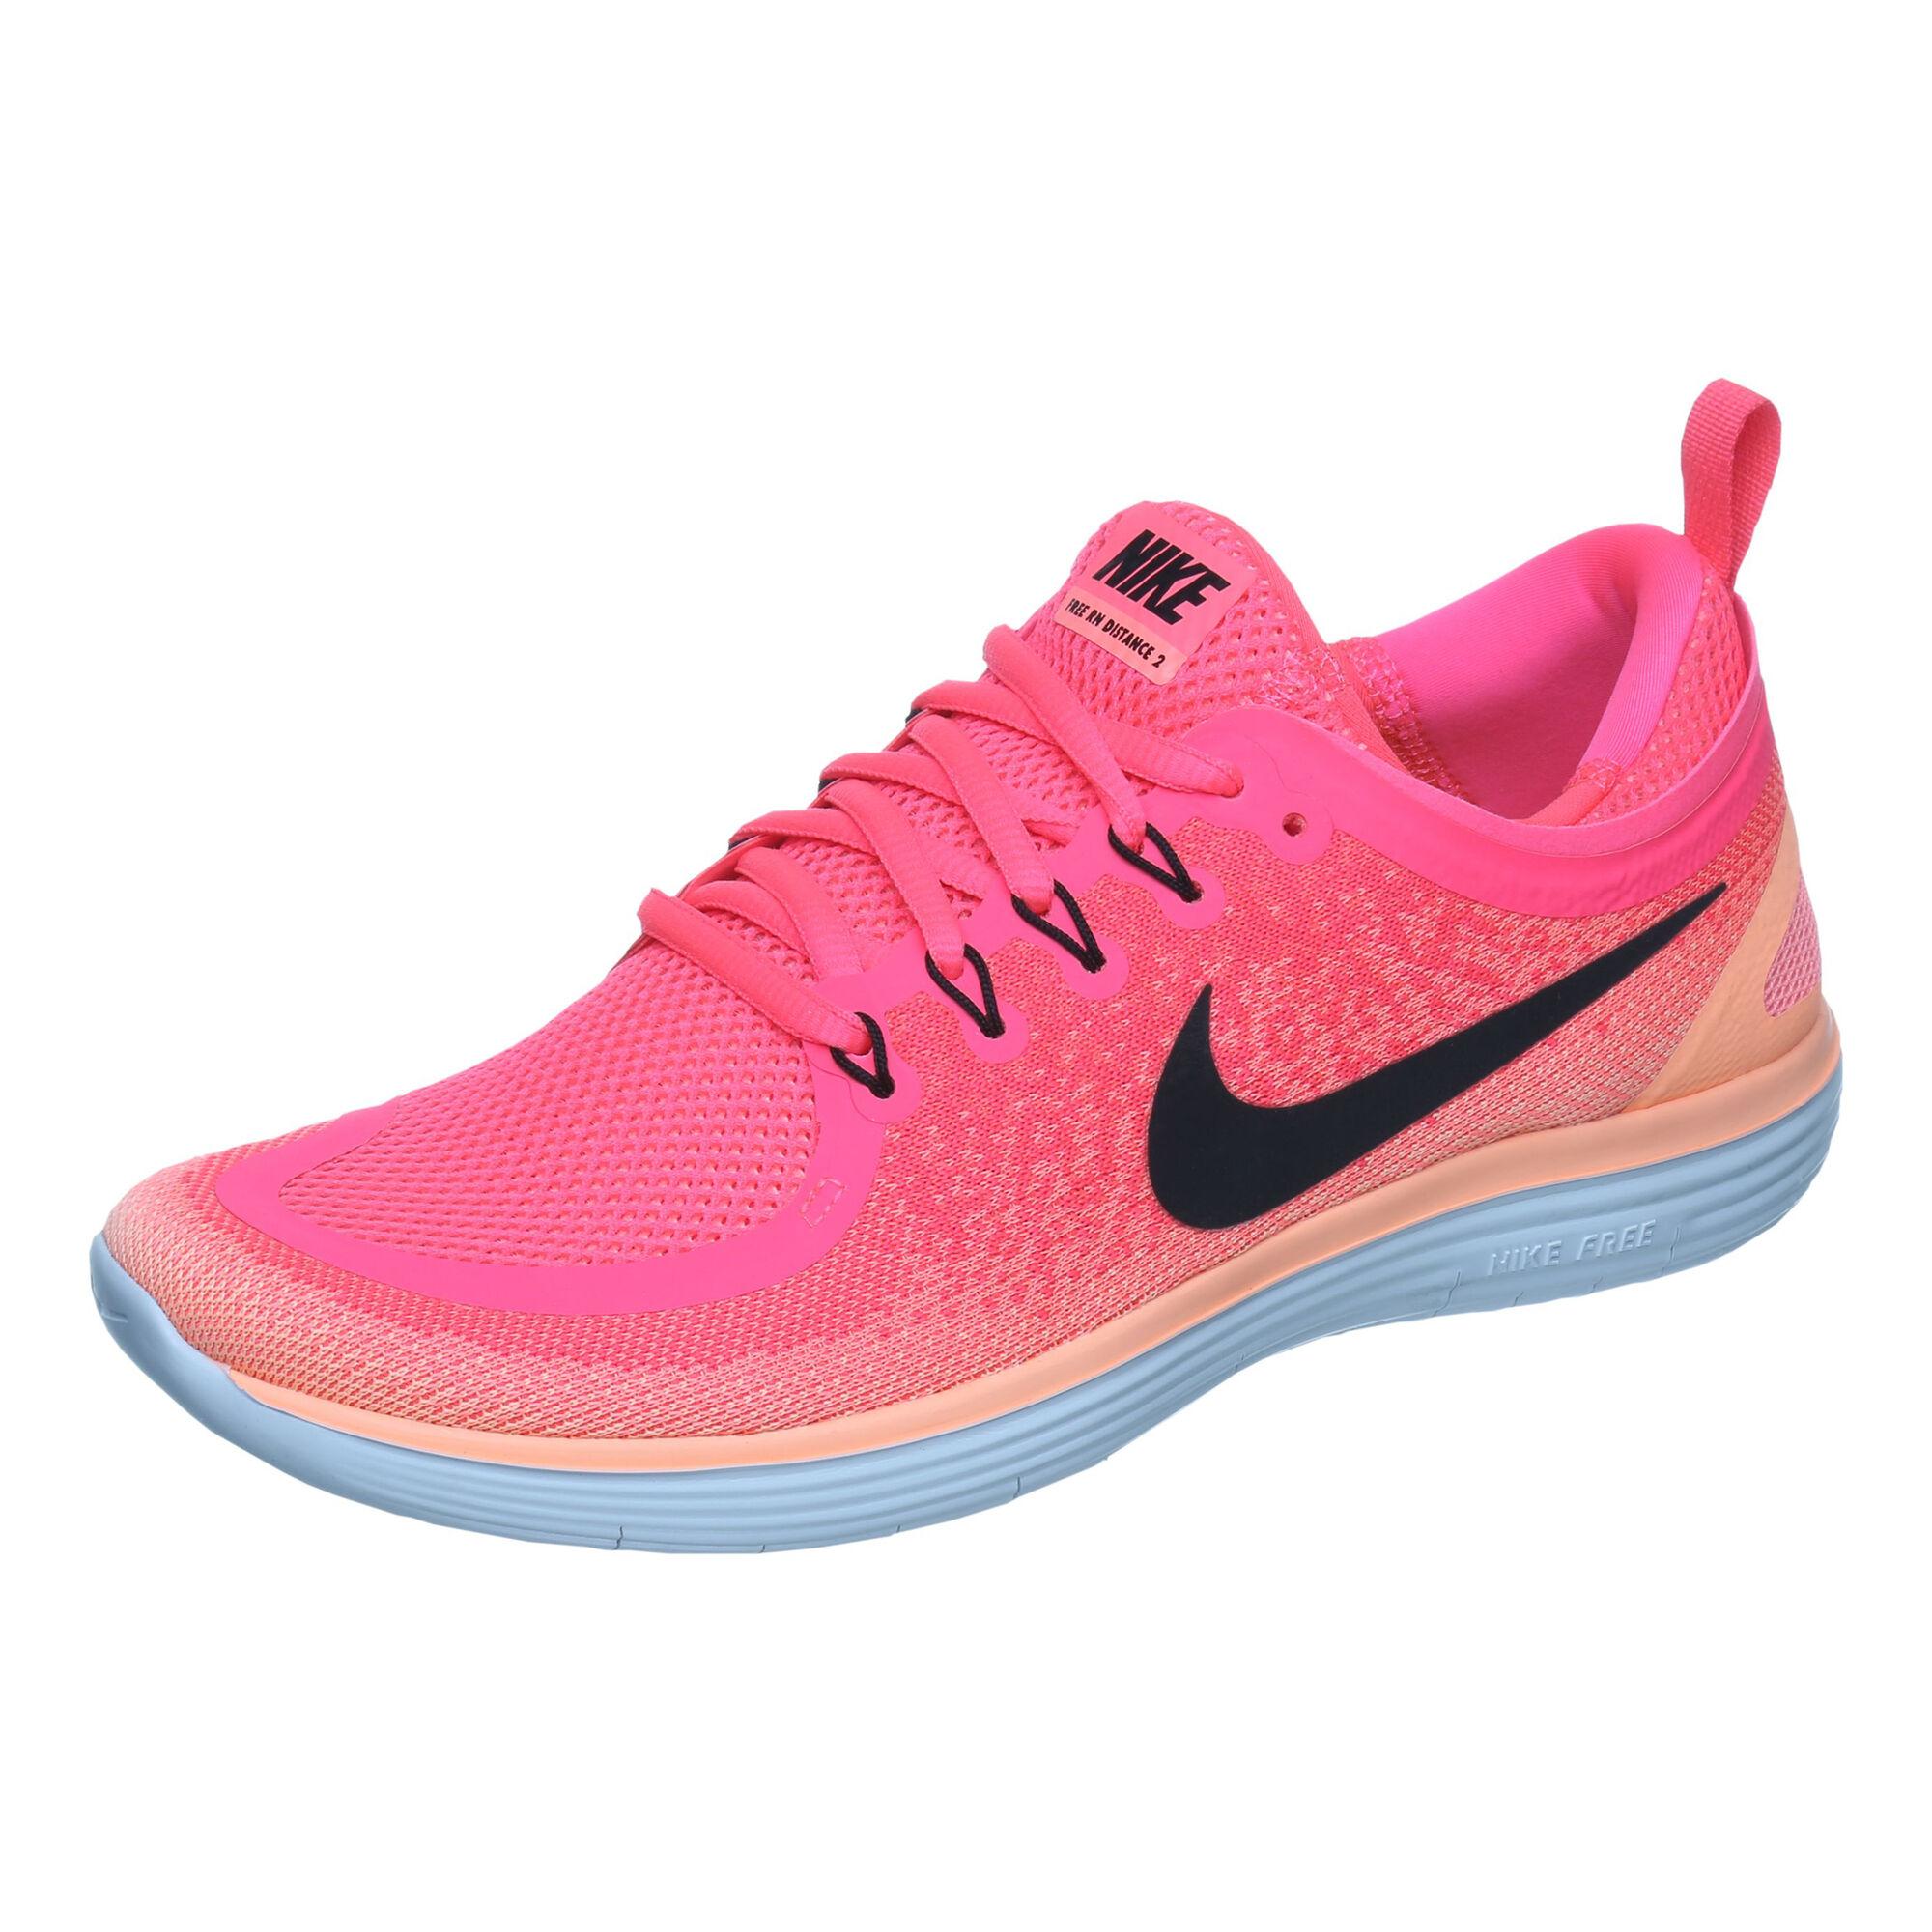 bf4e9081129 buy Nike Free RN Distance 2 Natural Running Shoe Women - Pink, Black ...